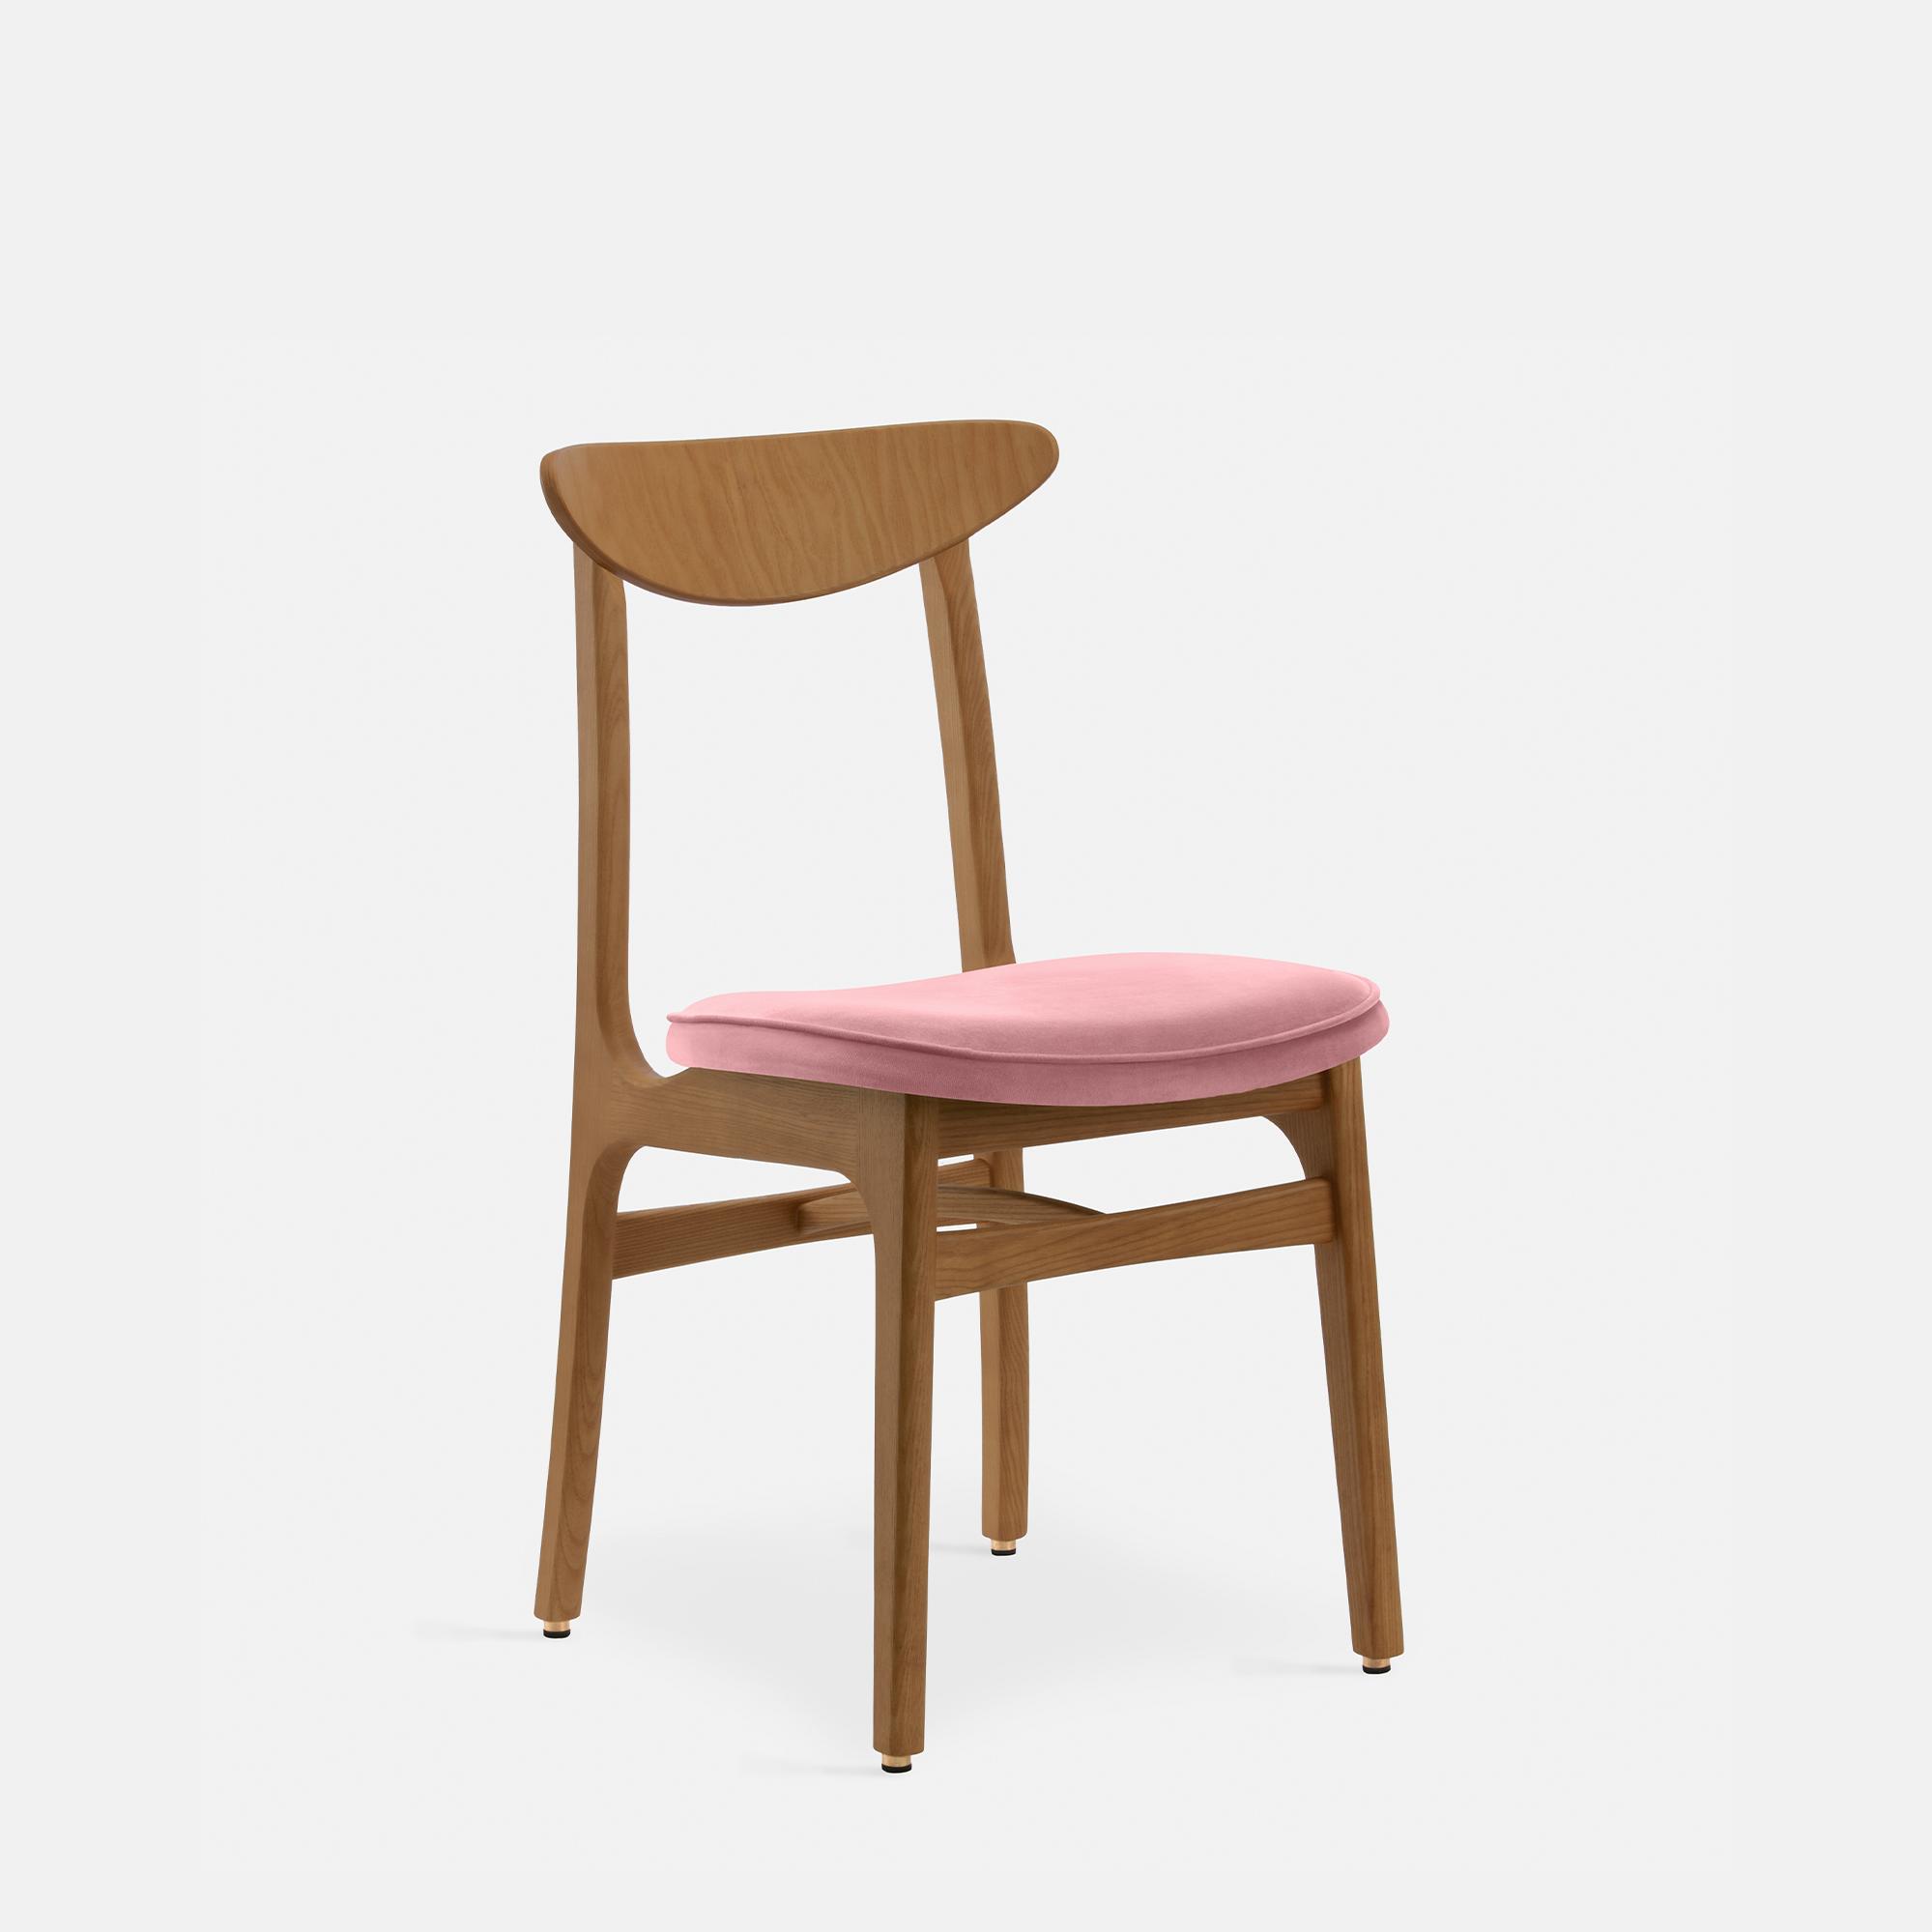 366-Concept-200-190-Chair-Mix-W03-Velvet-Powder-Pink